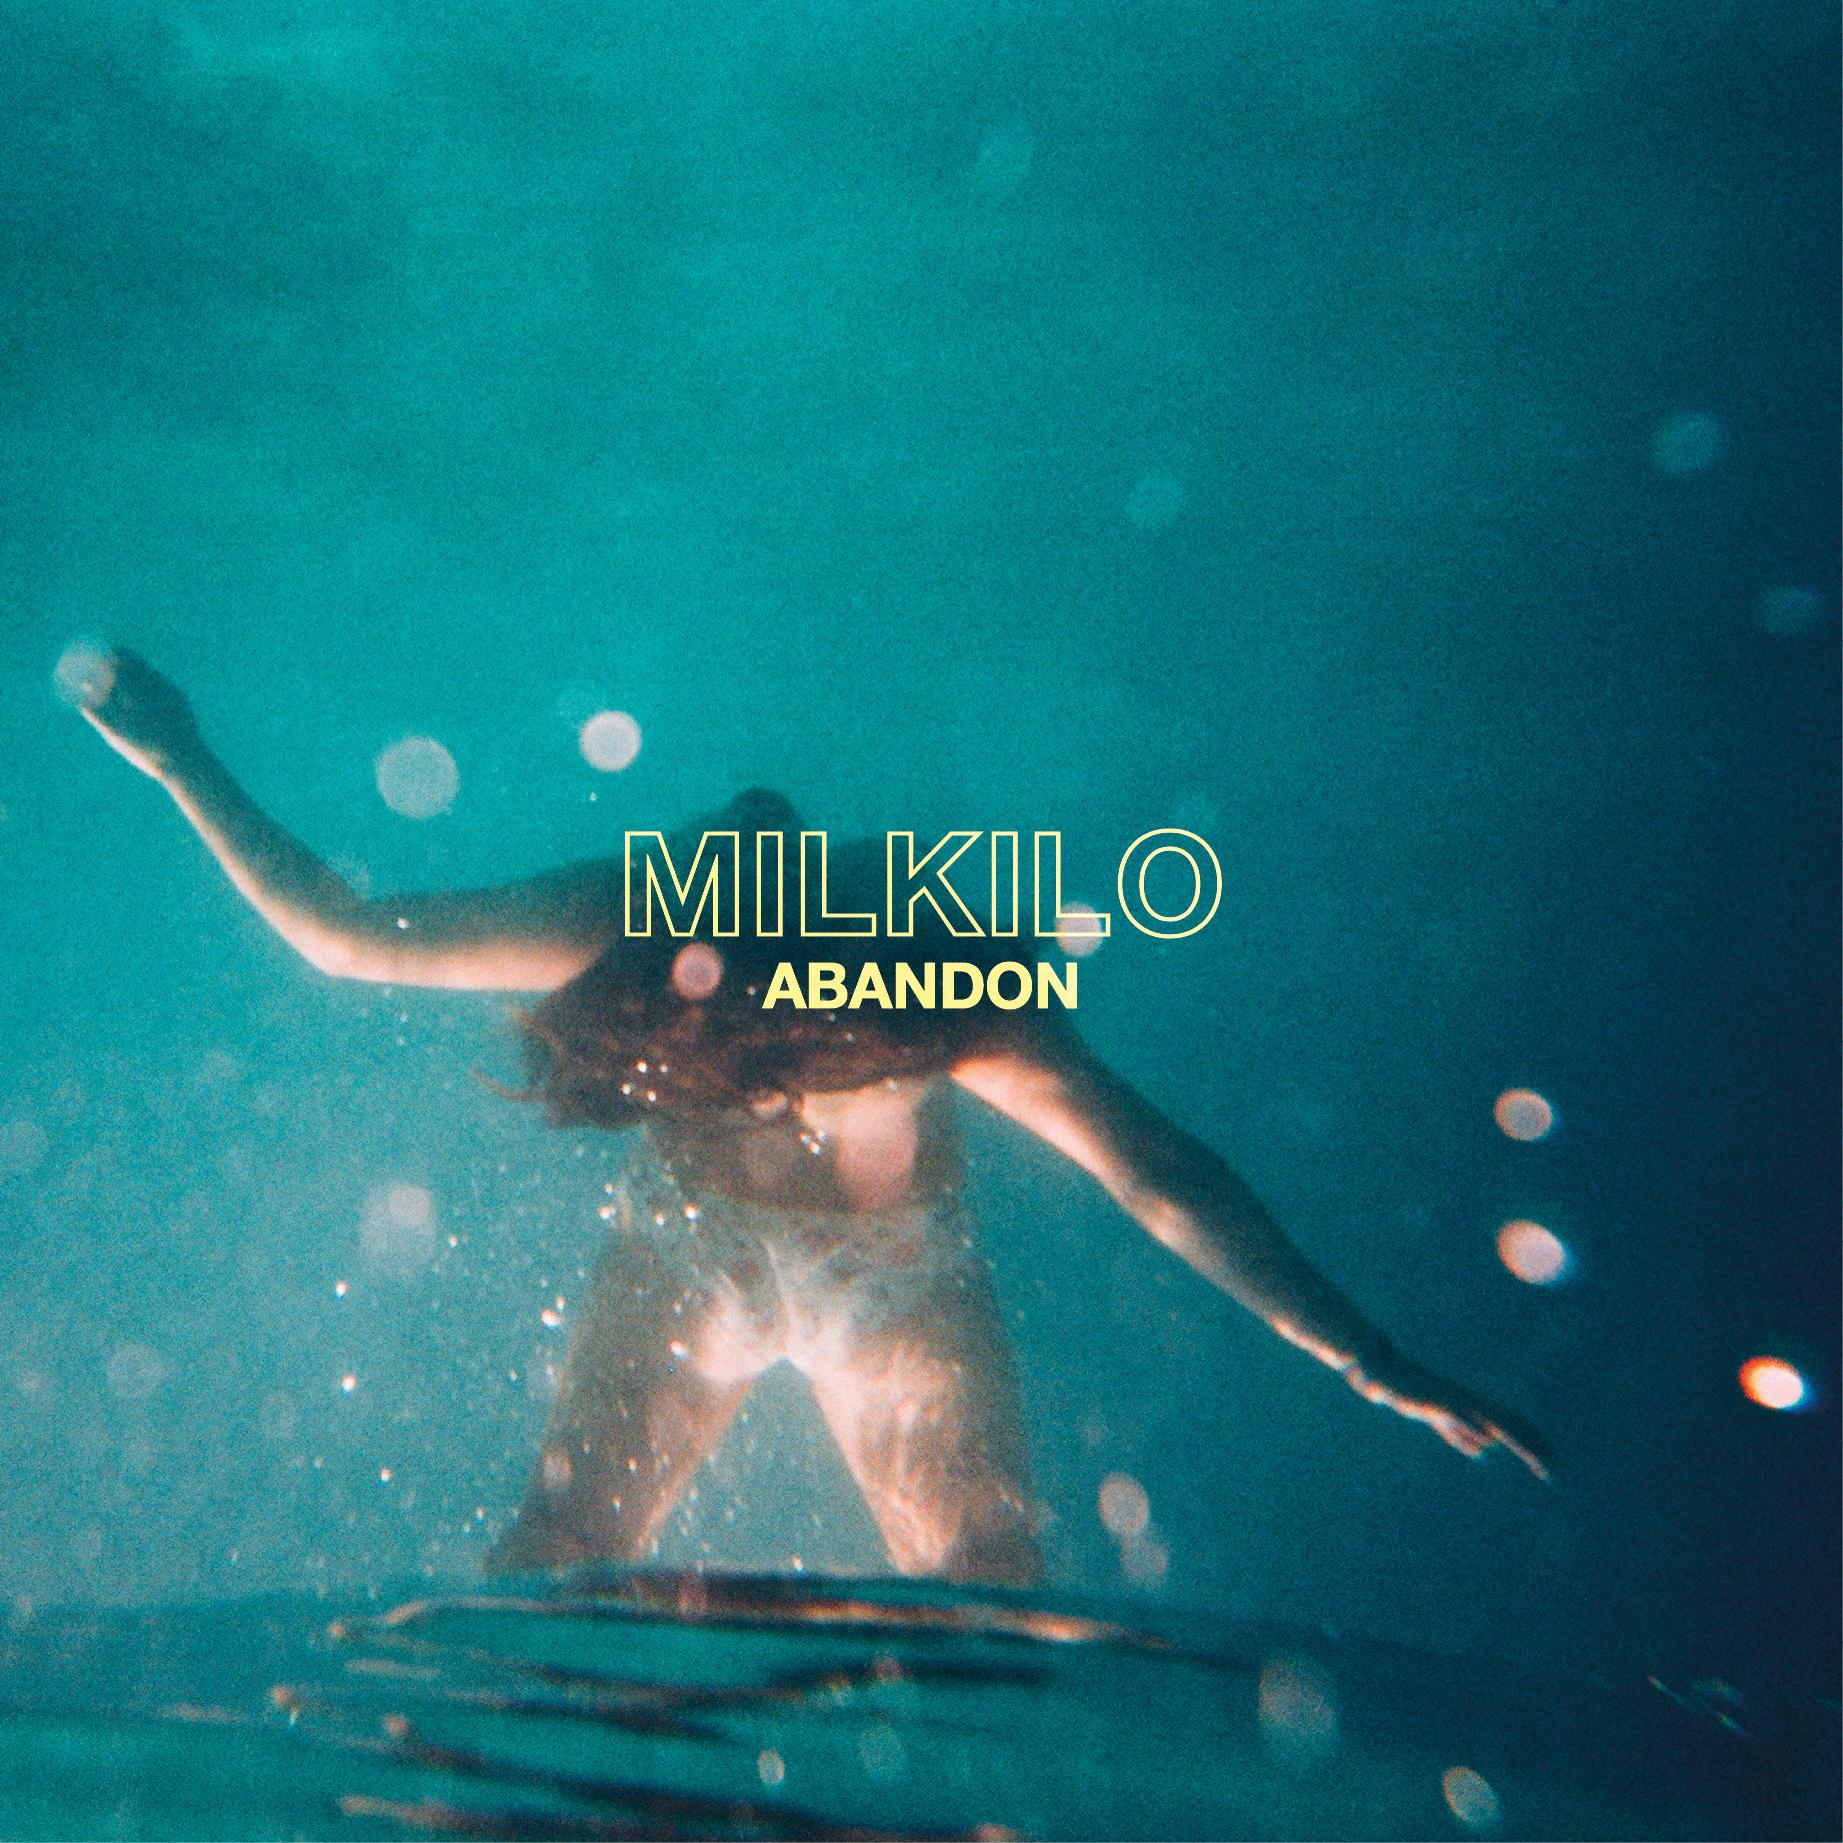 [VOX41] MILKILO - ABANDON [BUNDLES]